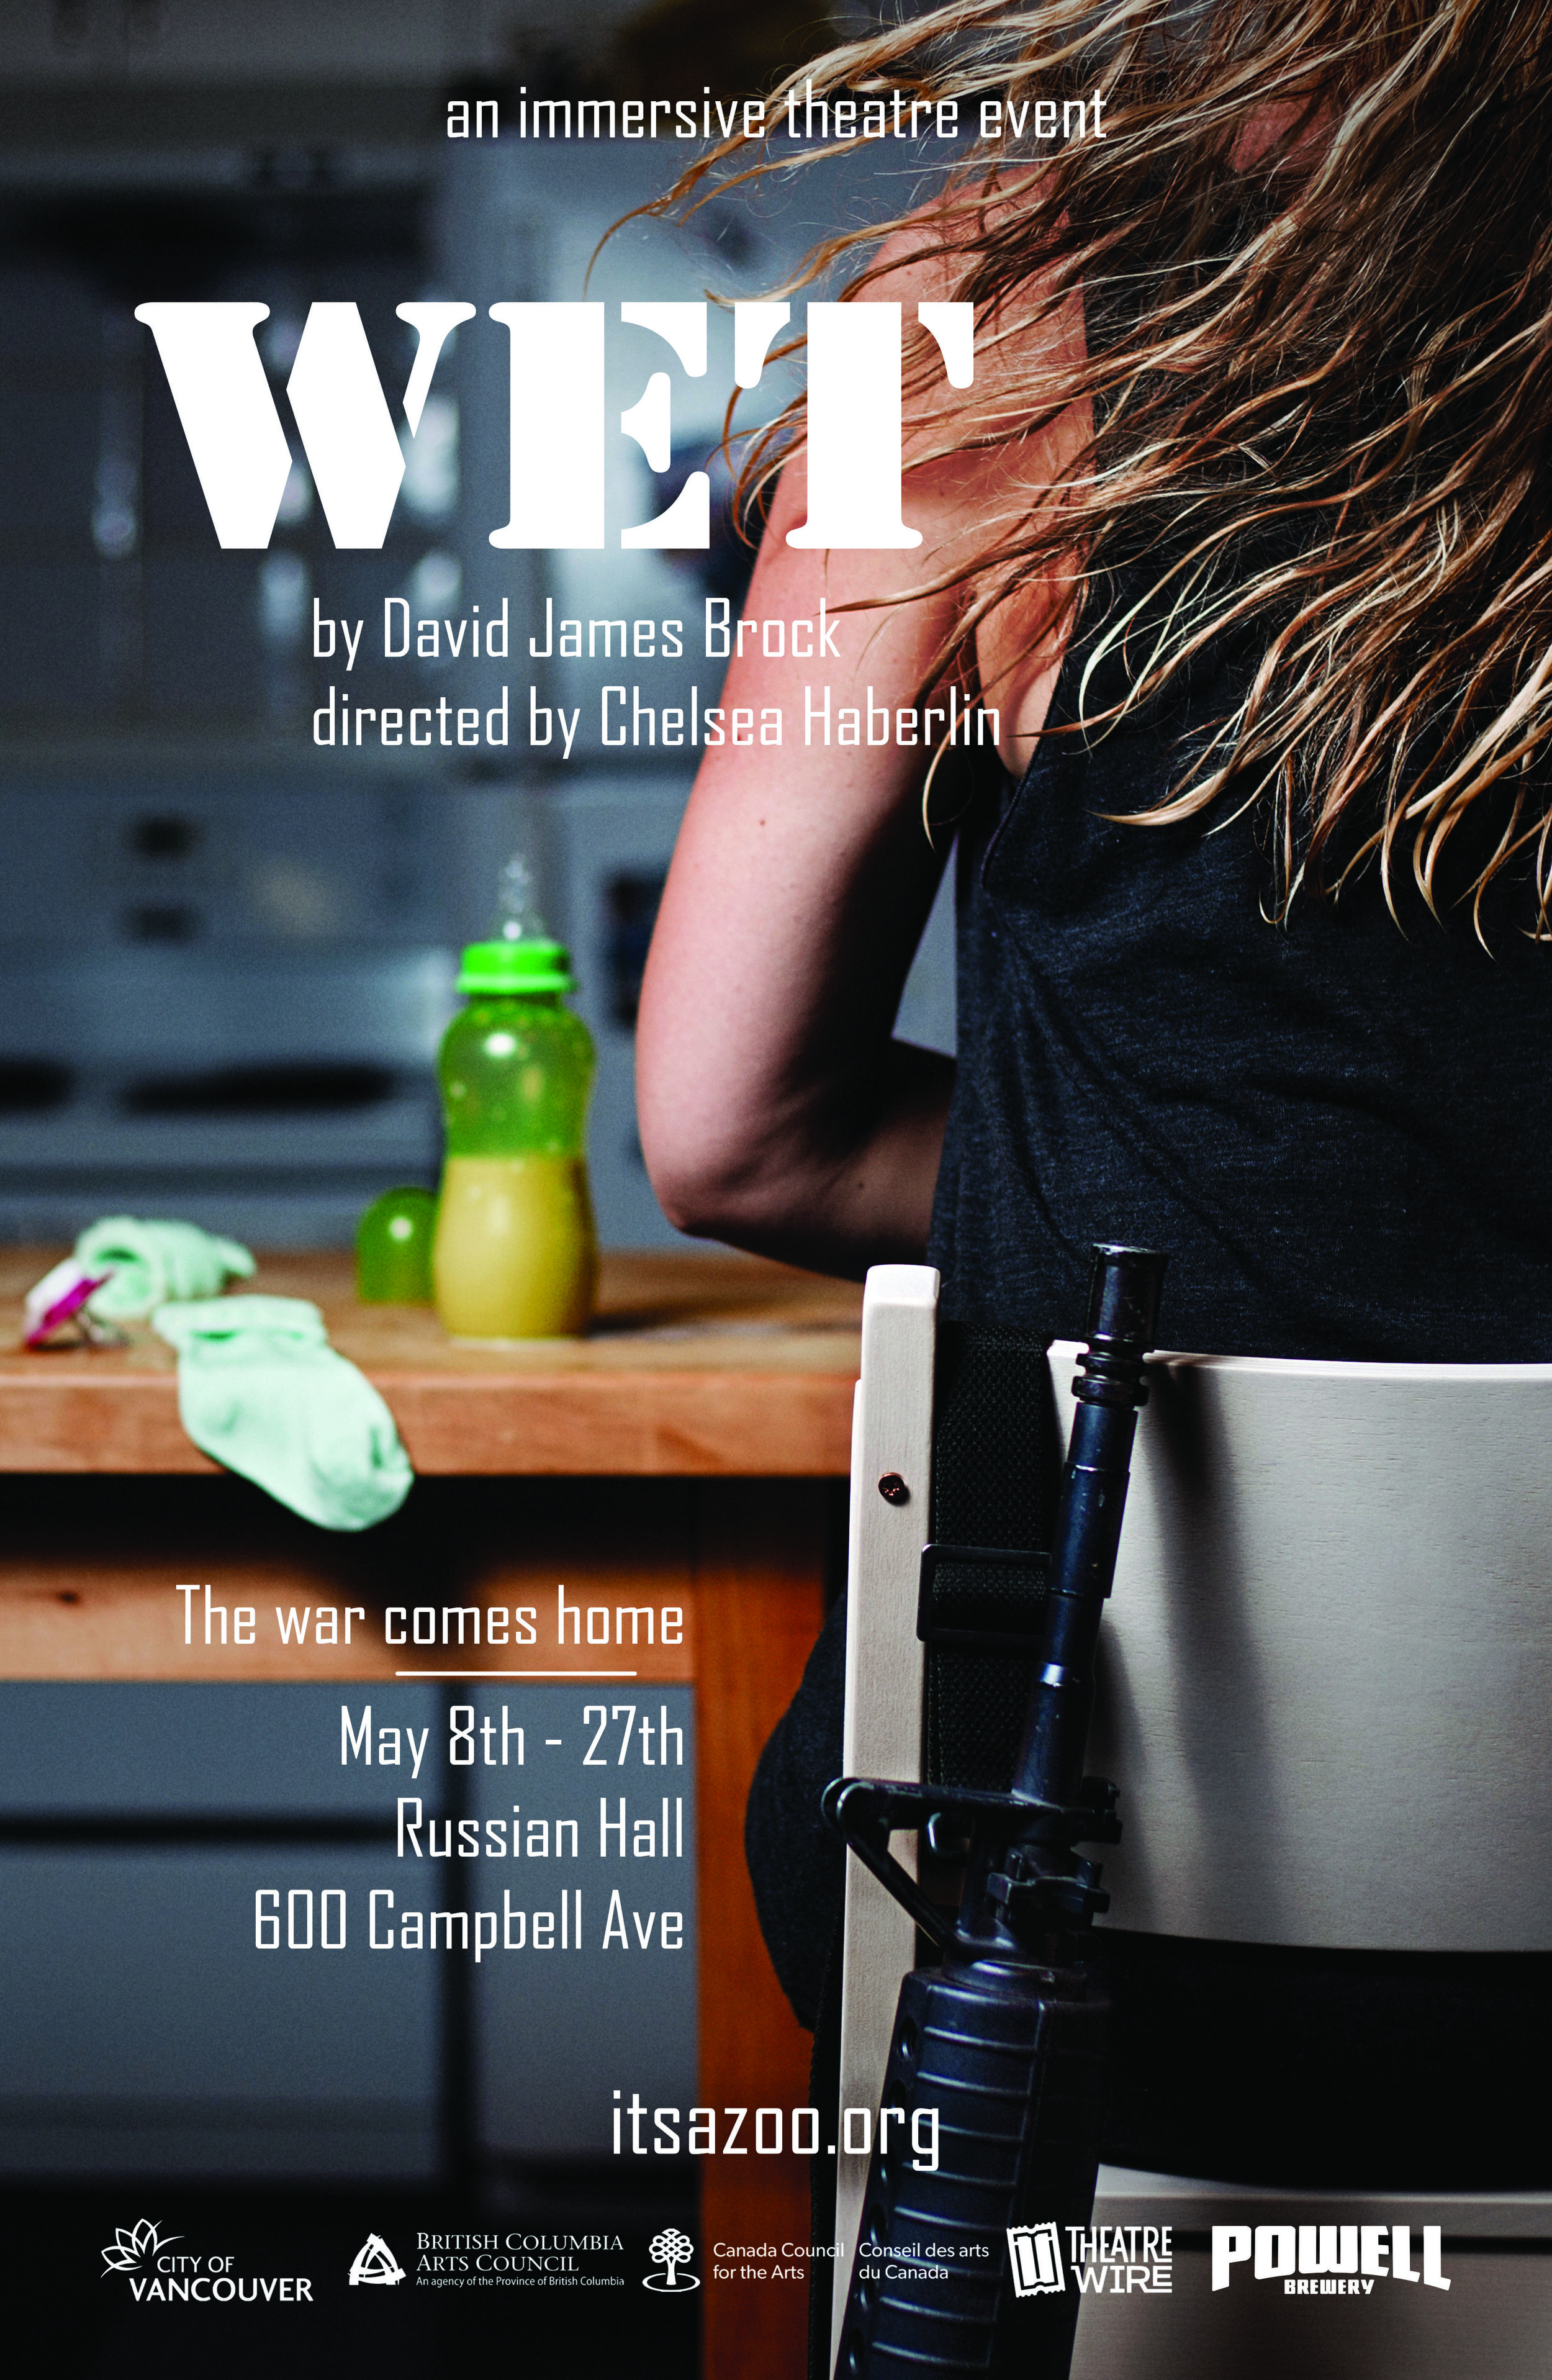 Itsazoo_Wet_11x17_Poster_CMYK_DRAFT05.jpg